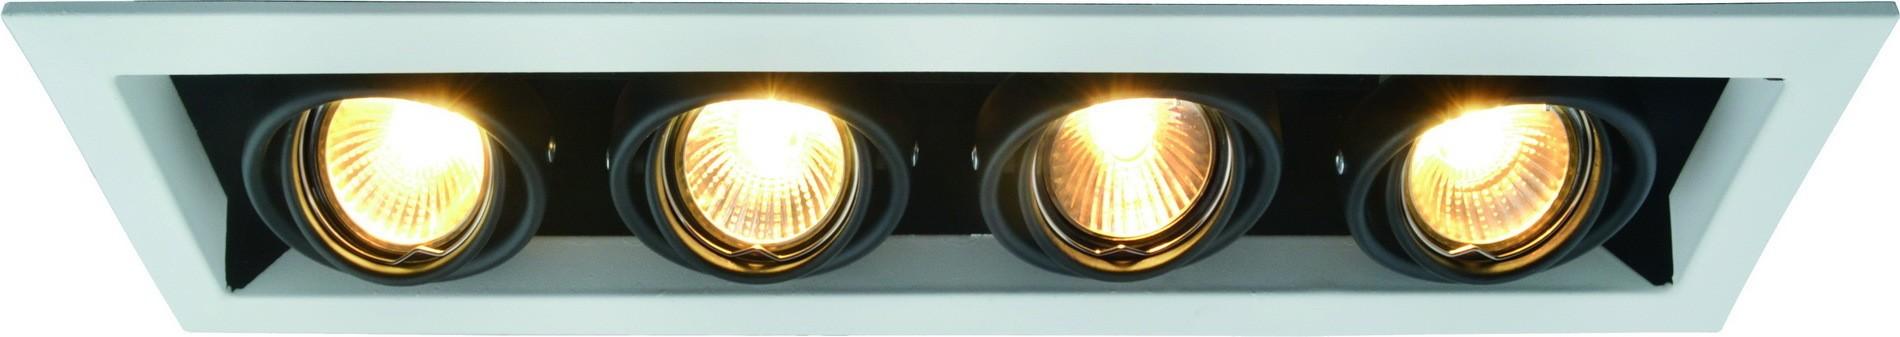 Карданный светильник